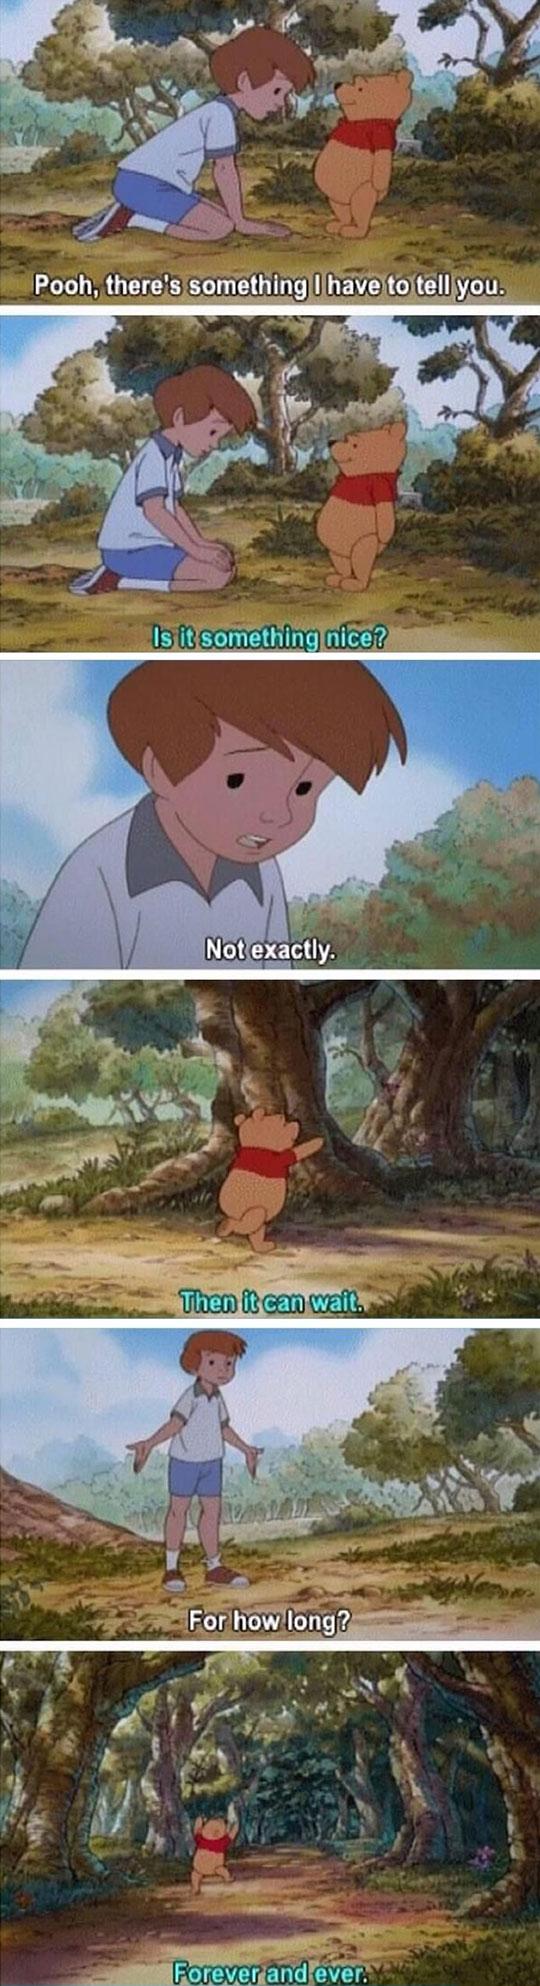 cool-Winnie-Pooh-Christopher-Robin-secret